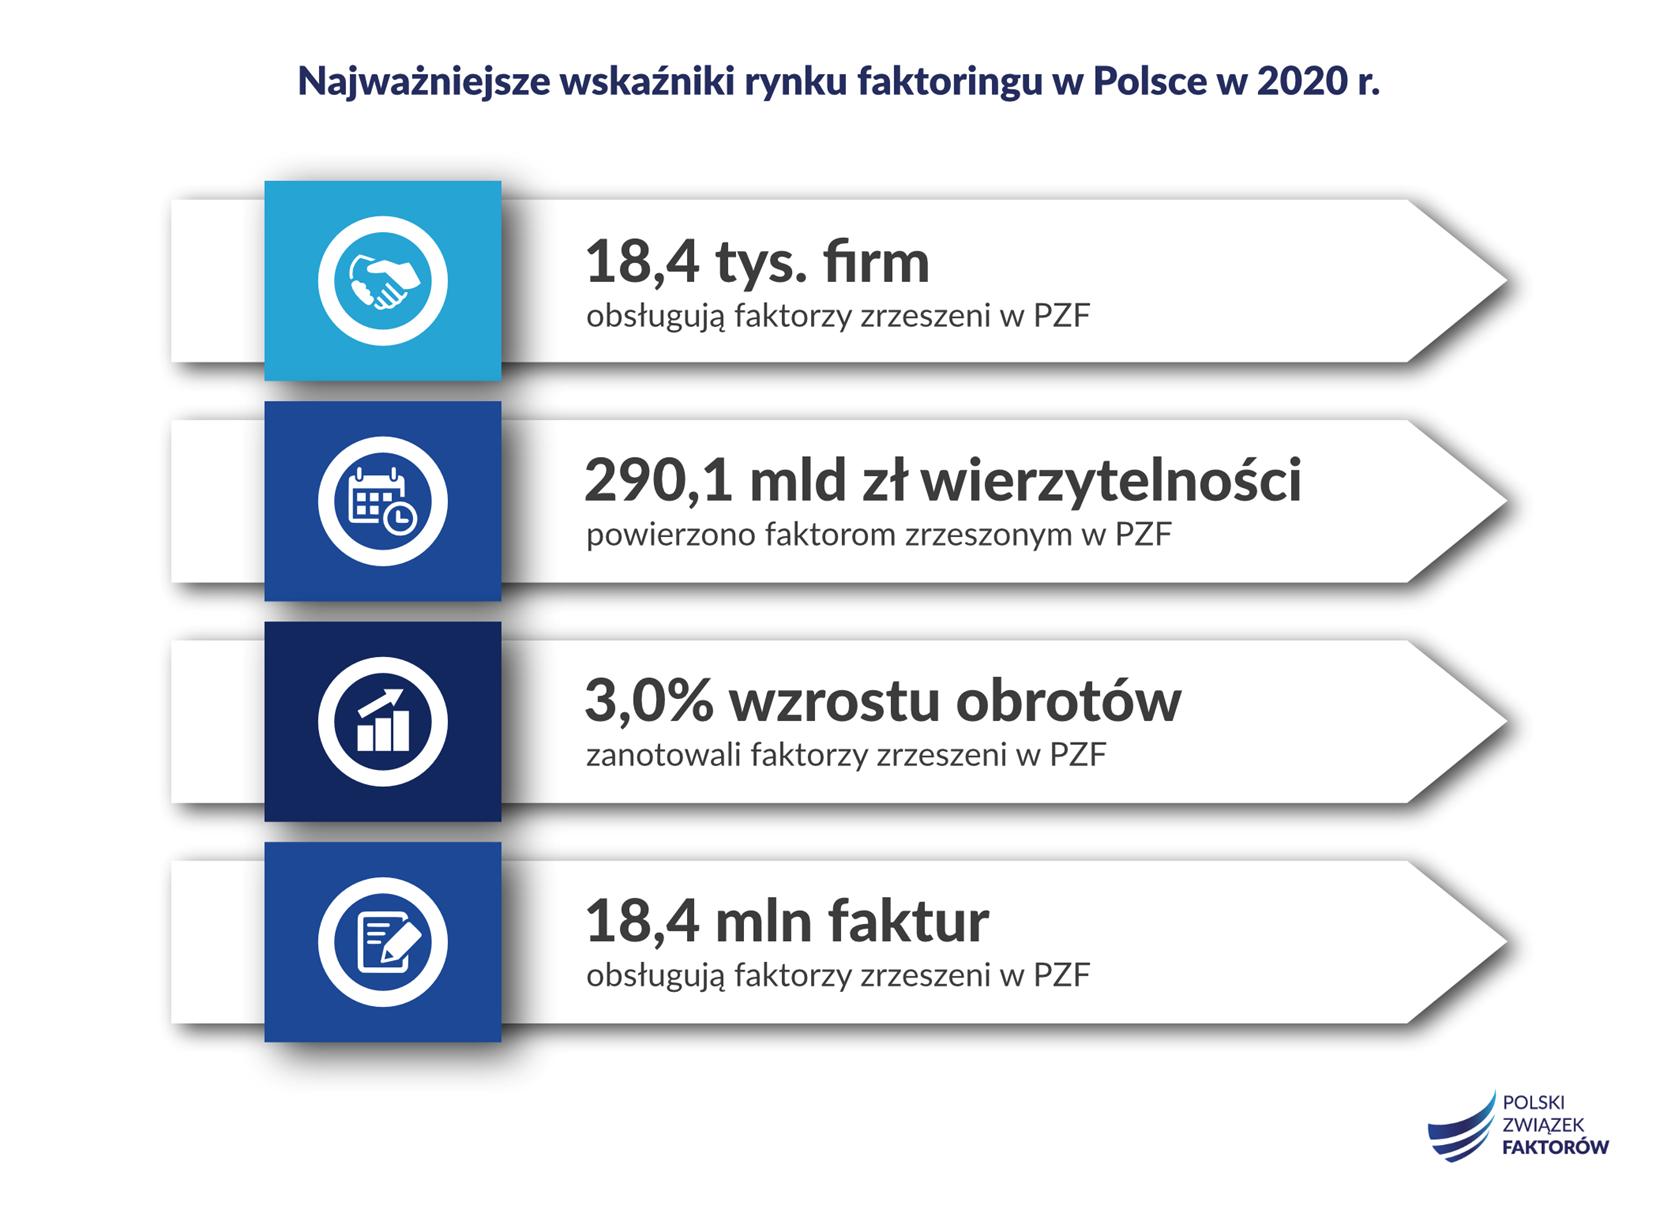 faktoring podsumowanie 2020